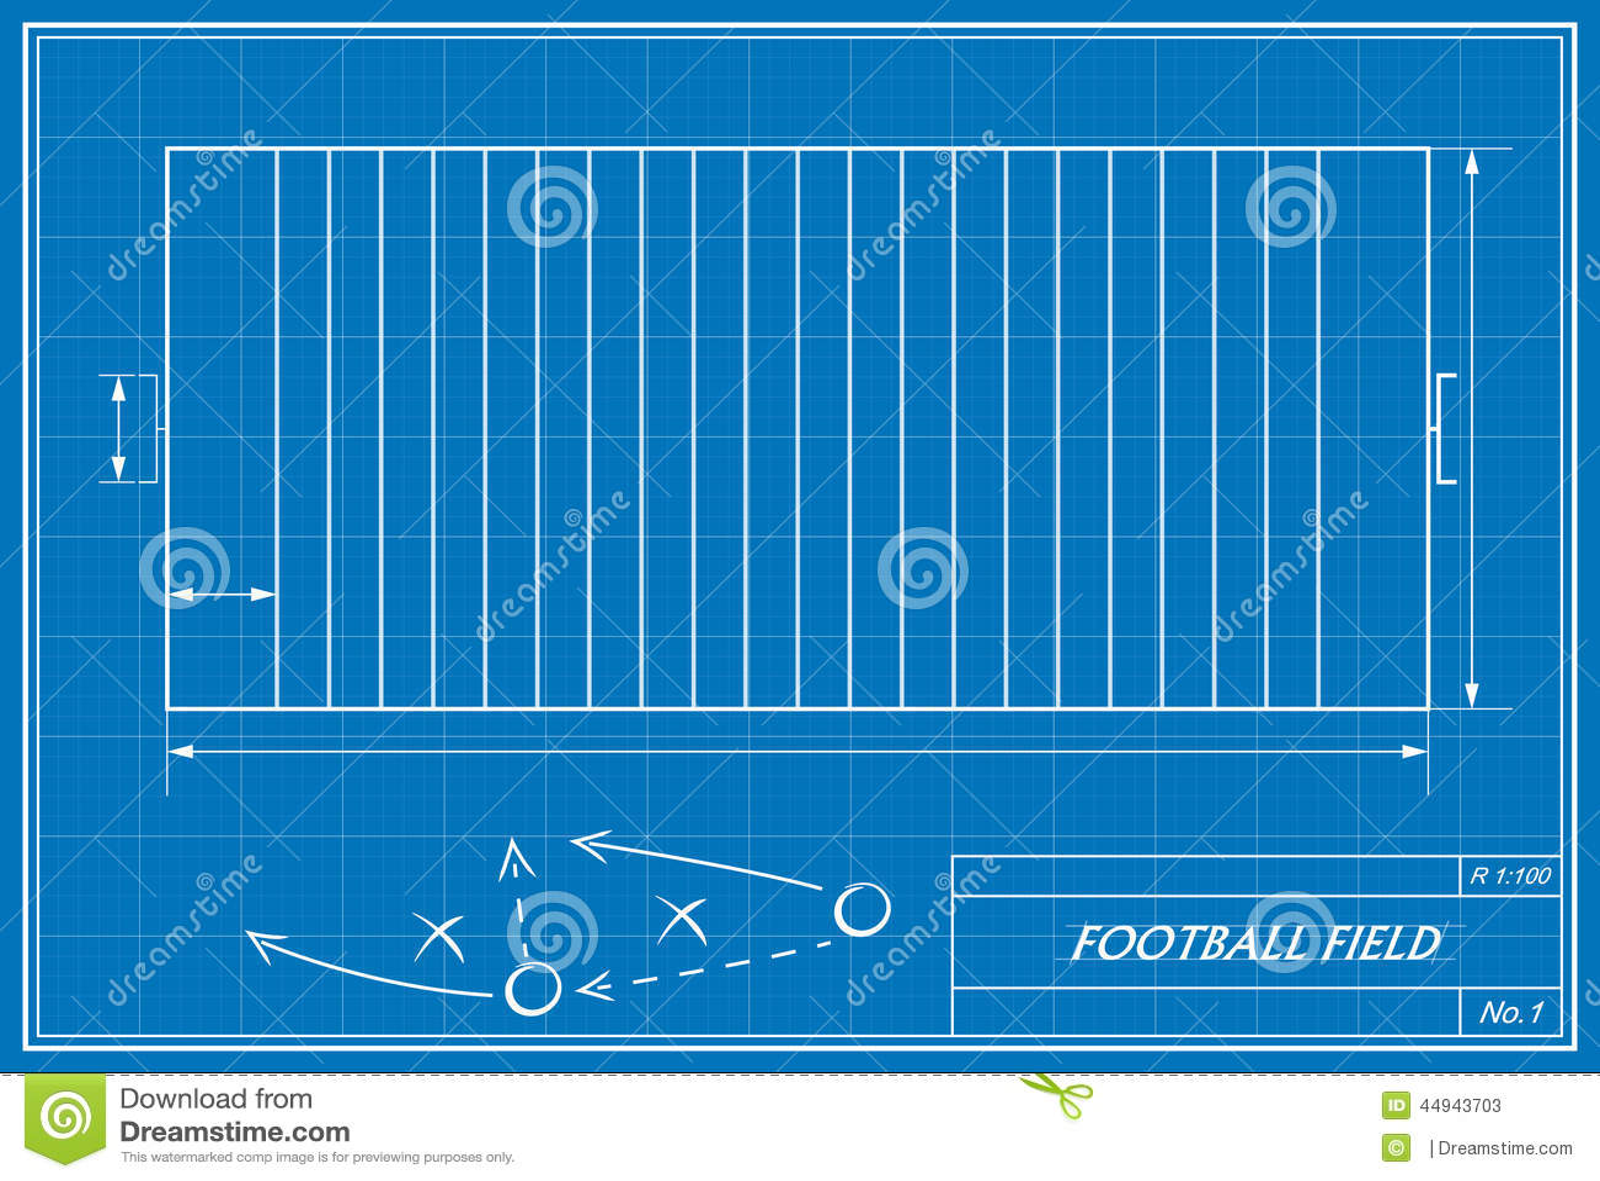 Football Field Blueprint Stock Illustrations 57 Football Field Blueprint Stock Illustrations Vectors Clipart Dreamstime